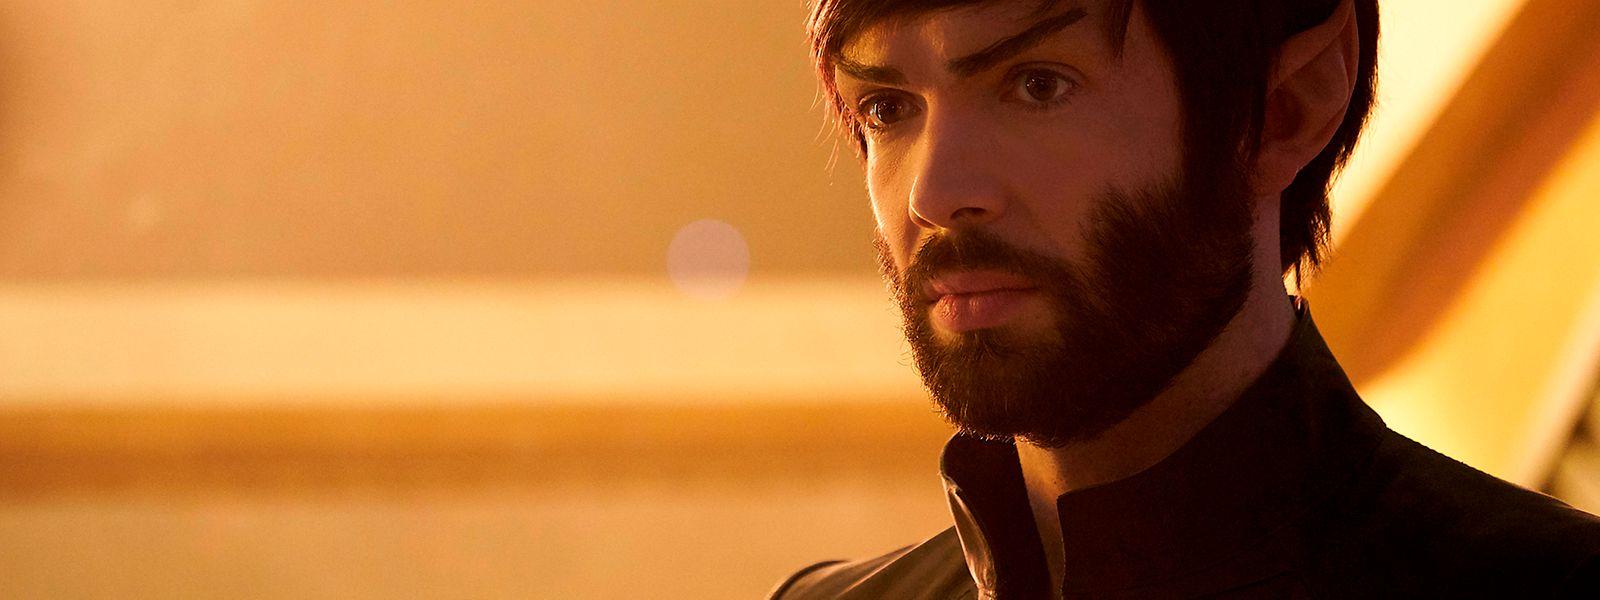 Ethan Peck spielt in der neuen Staffel den jungen Spock.